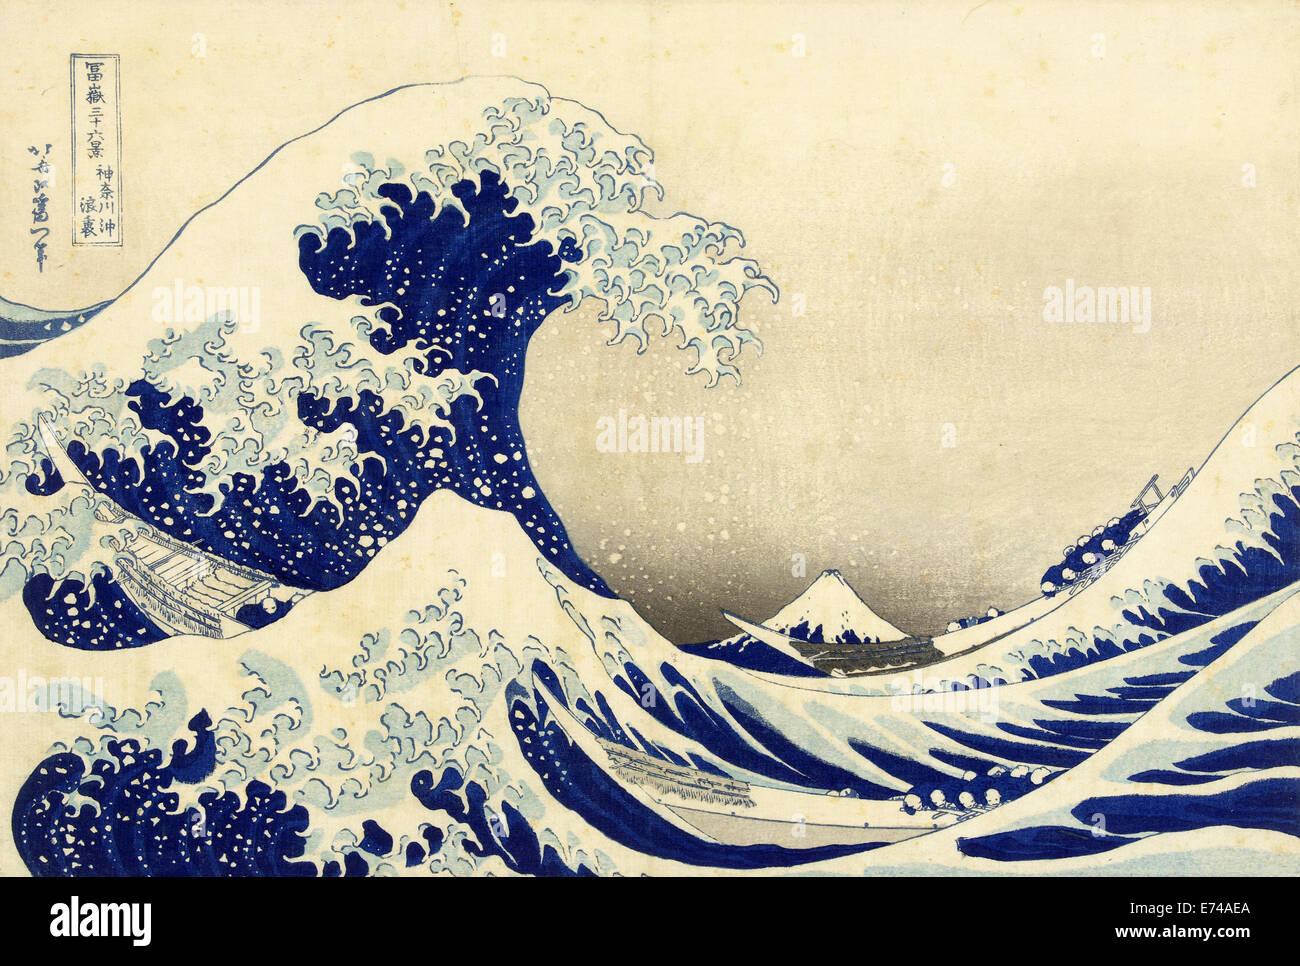 The Great Wave off Kanagawa - by Katsushika Hokusai, 1829 - 1833 Stock Photo